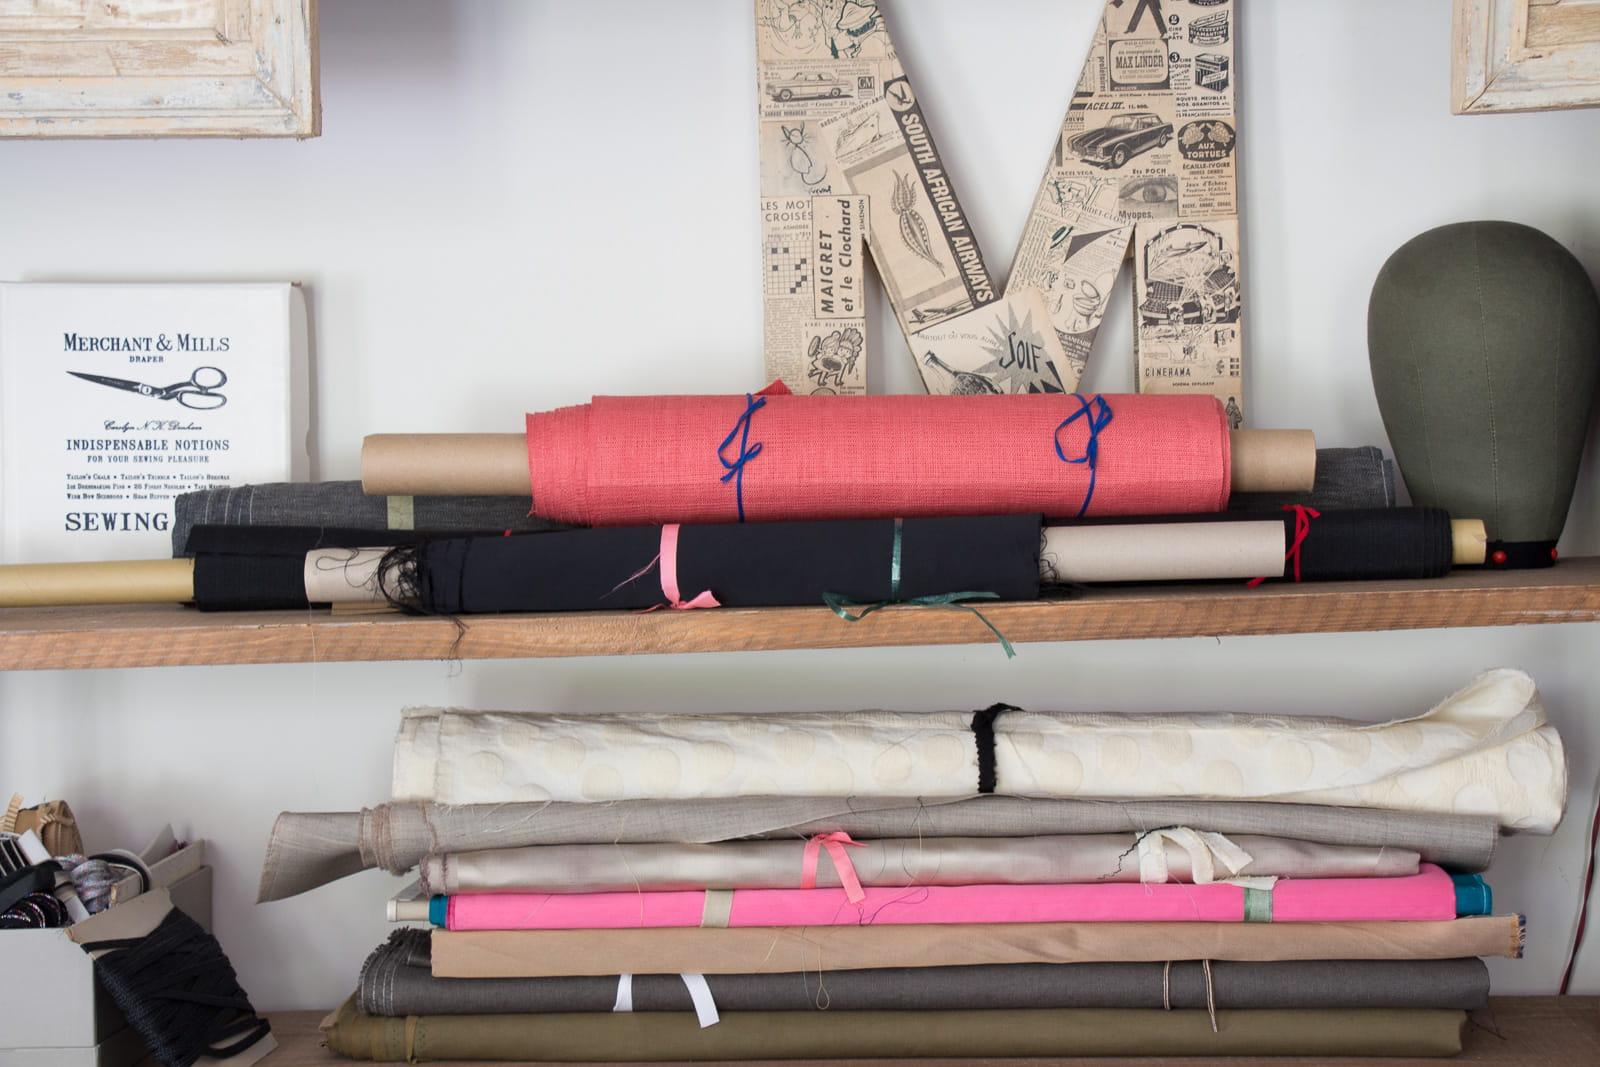 chutes de tissus rares et pr cieux. Black Bedroom Furniture Sets. Home Design Ideas